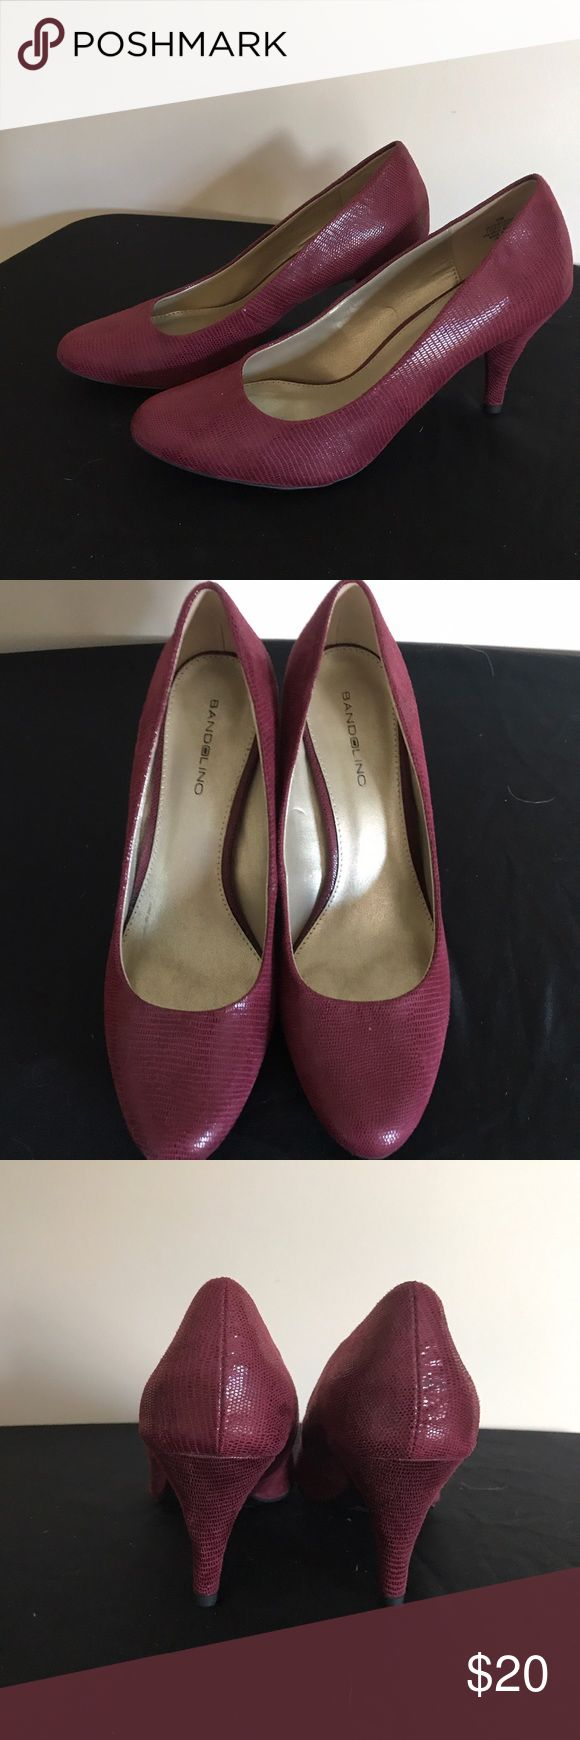 Bandolino Maroon Pumps Gently worn maroon pumps Bandolino Shoes Heels